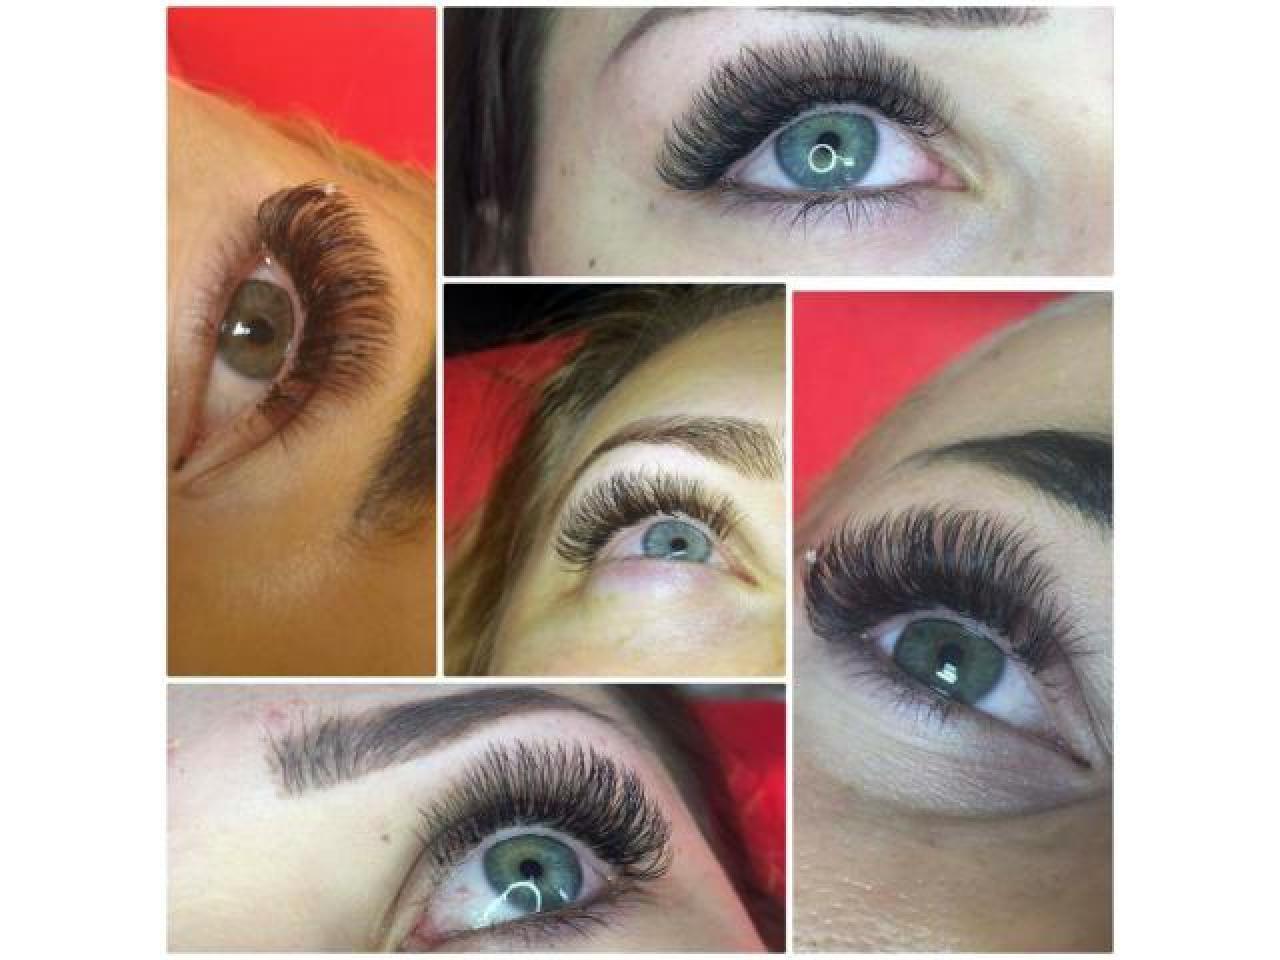 макияж, прически, наращивание ресниц. Makeup, Hairstyle, Eyelash extensions - 3